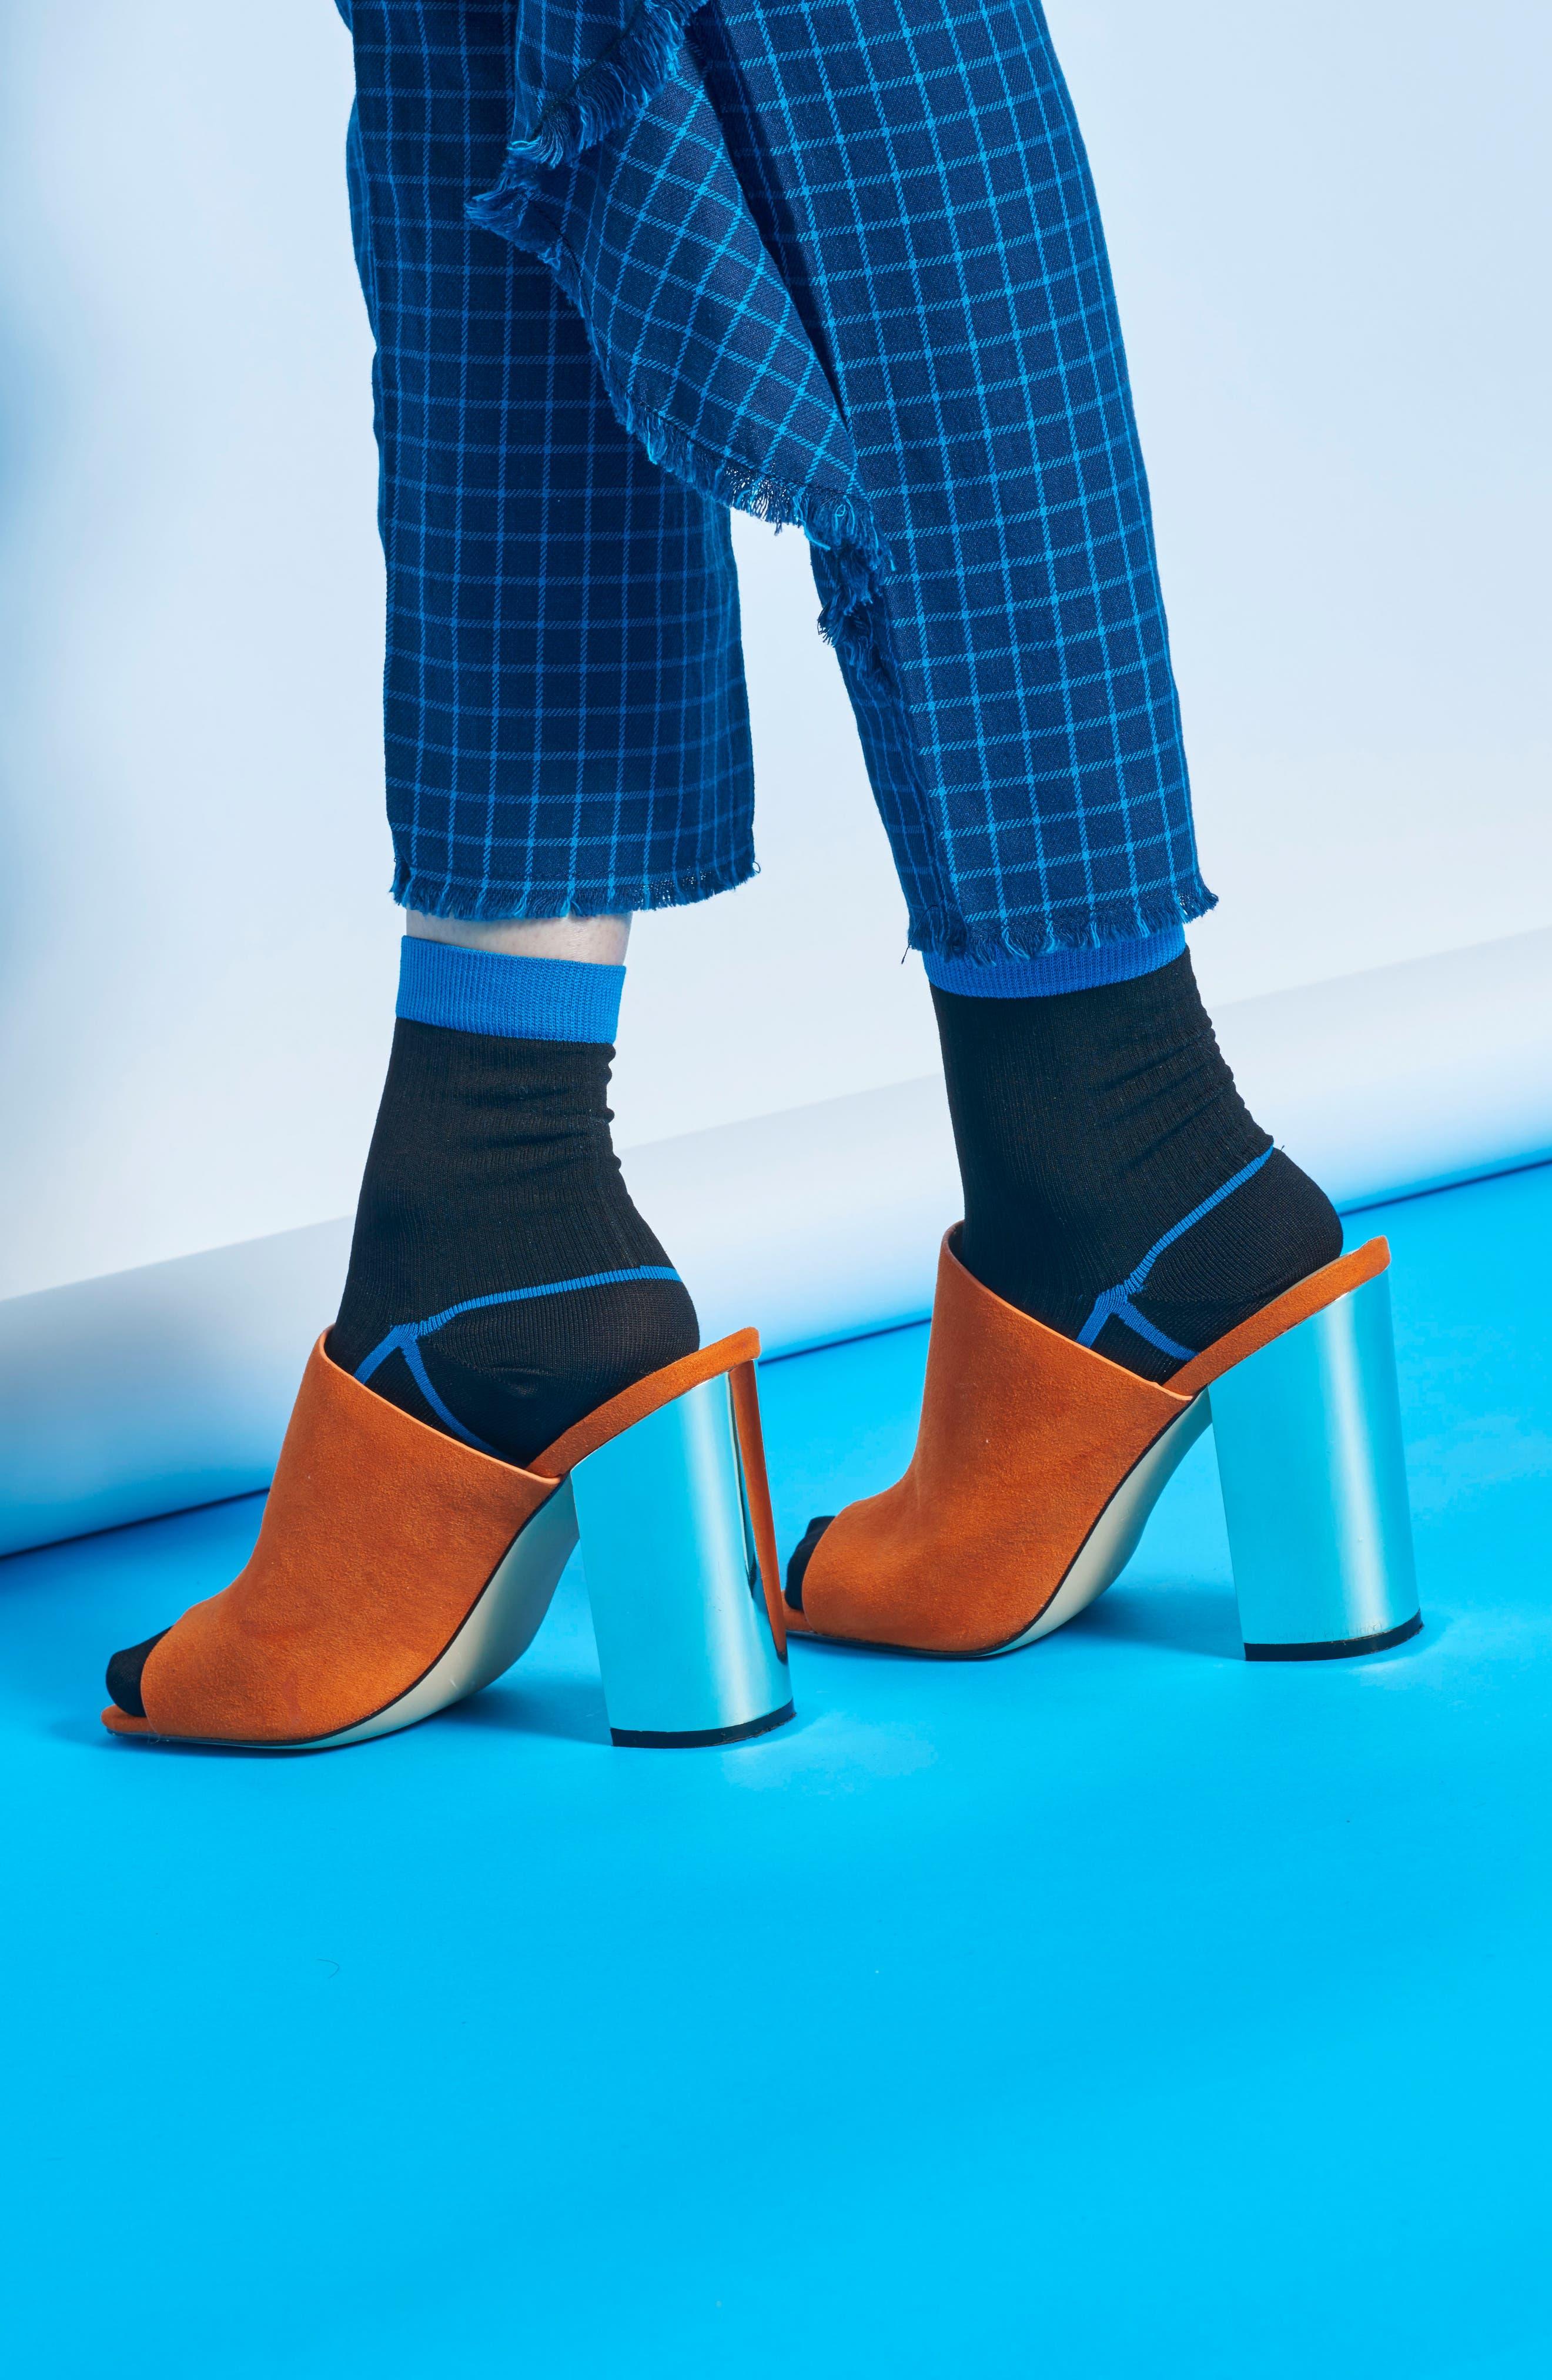 Lily Rib Ankle Socks,                             Alternate thumbnail 4, color,                             012